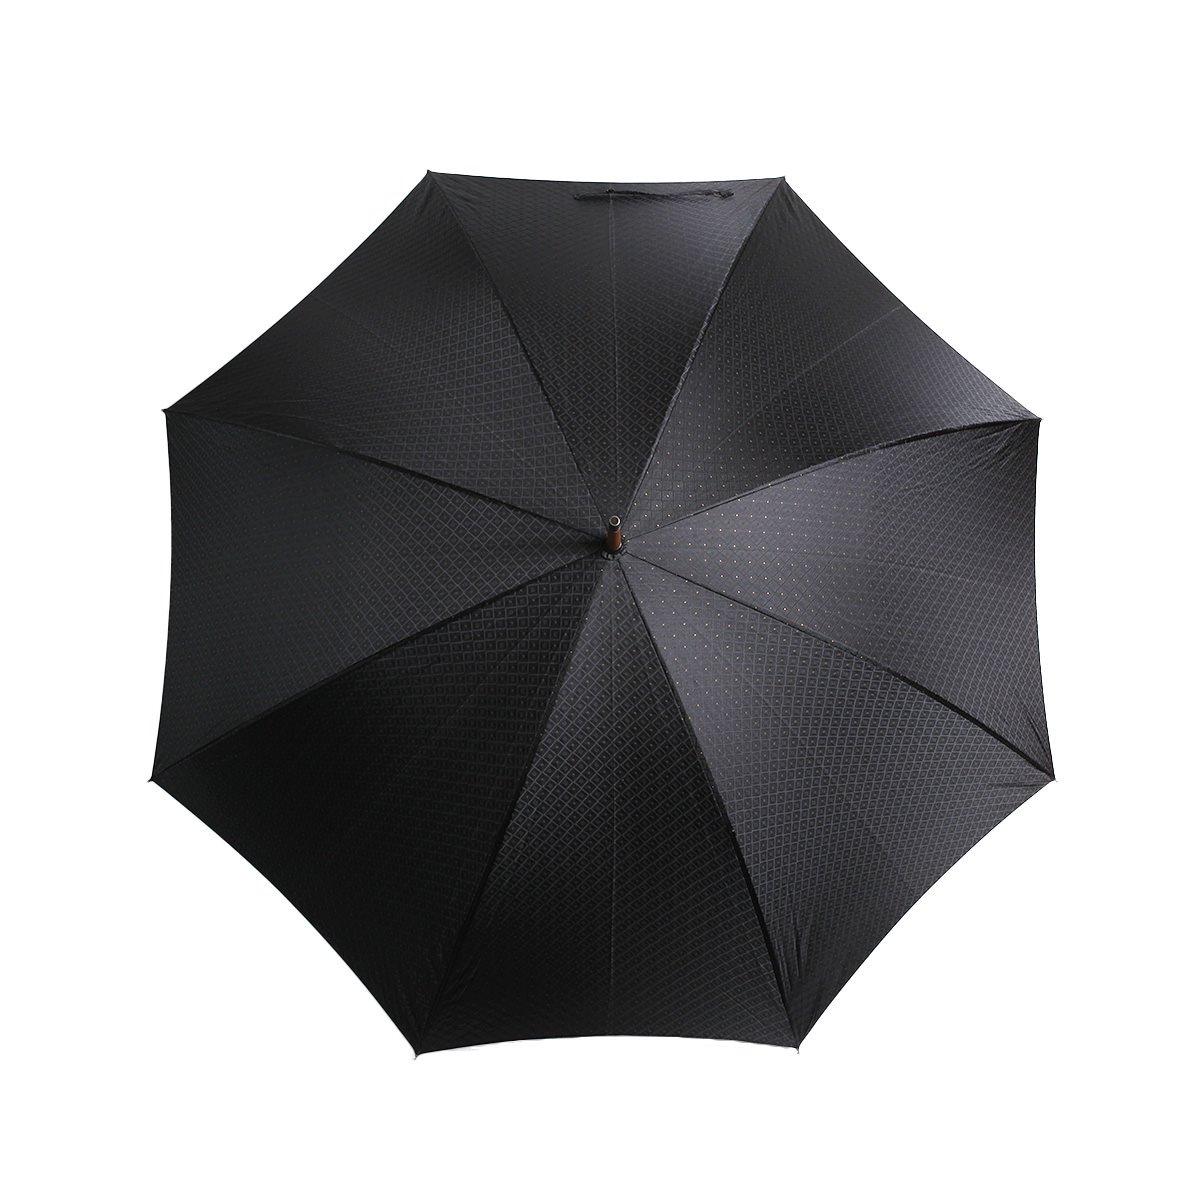 【WEB限定】FOX Frames 小紋柄 長傘(ブラック) 詳細画像8